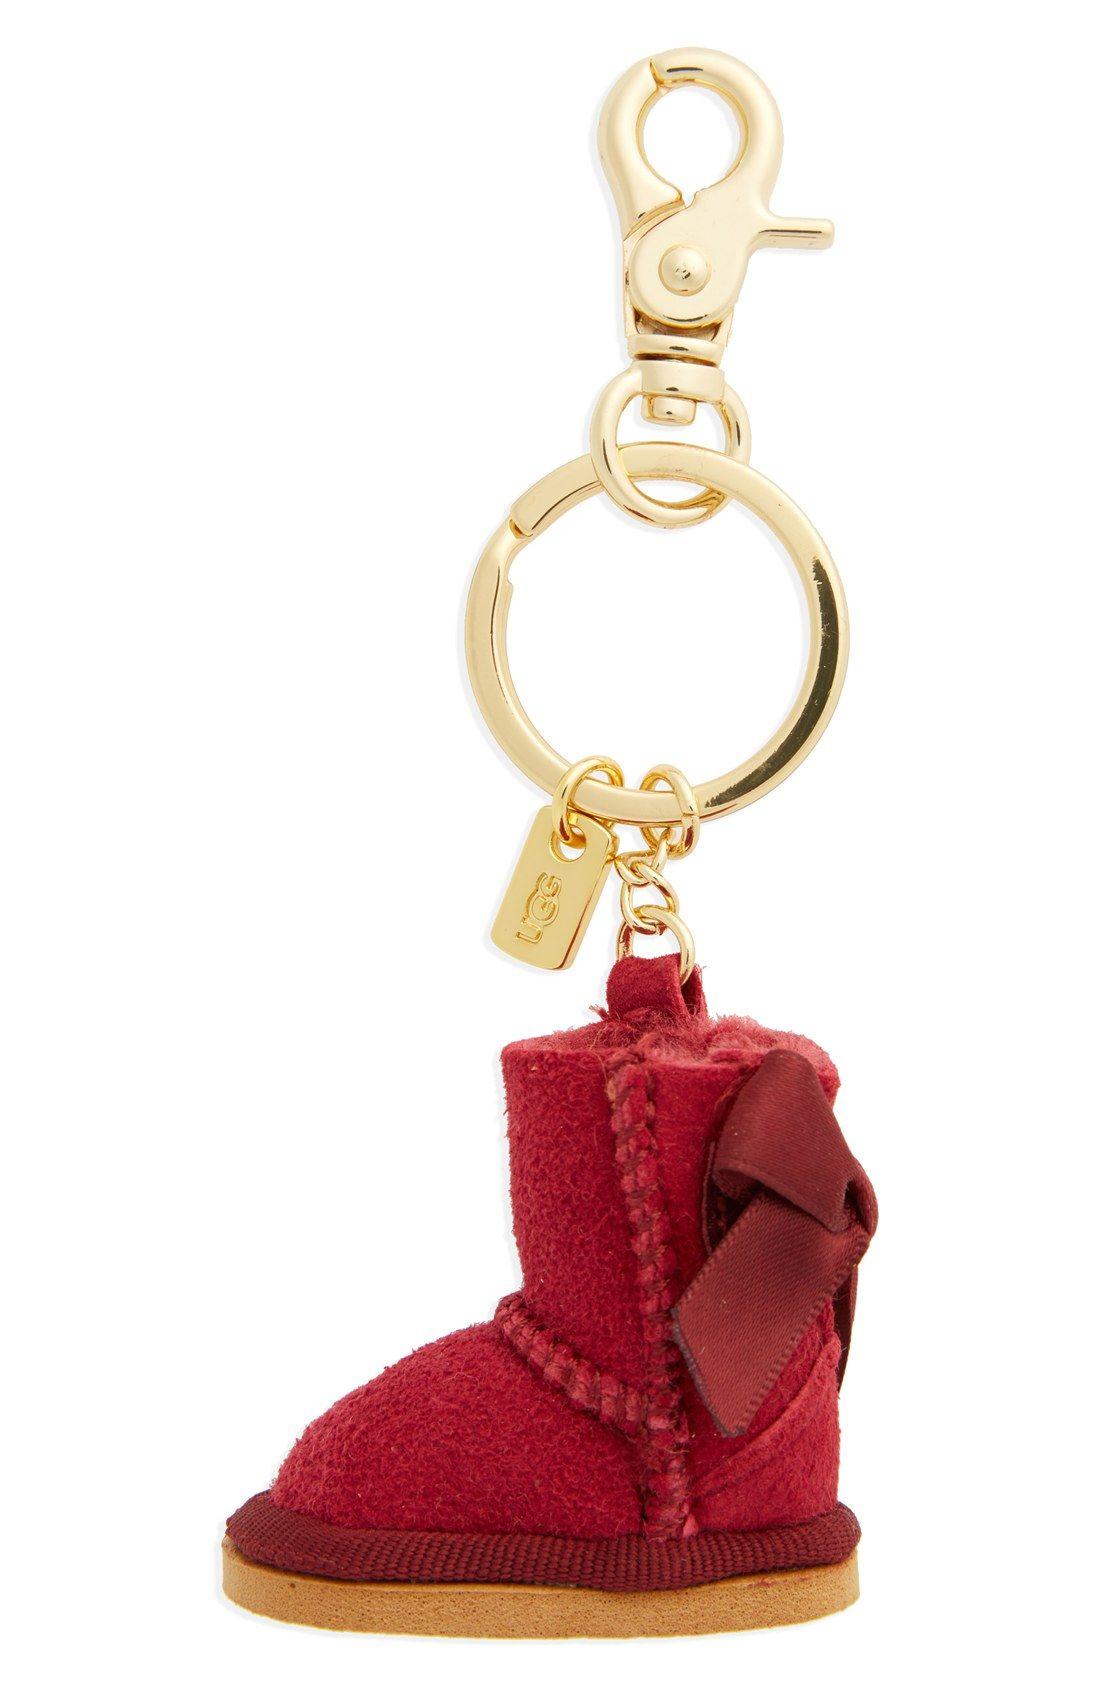 Adorable Ugg Keychain Perfect Stocking